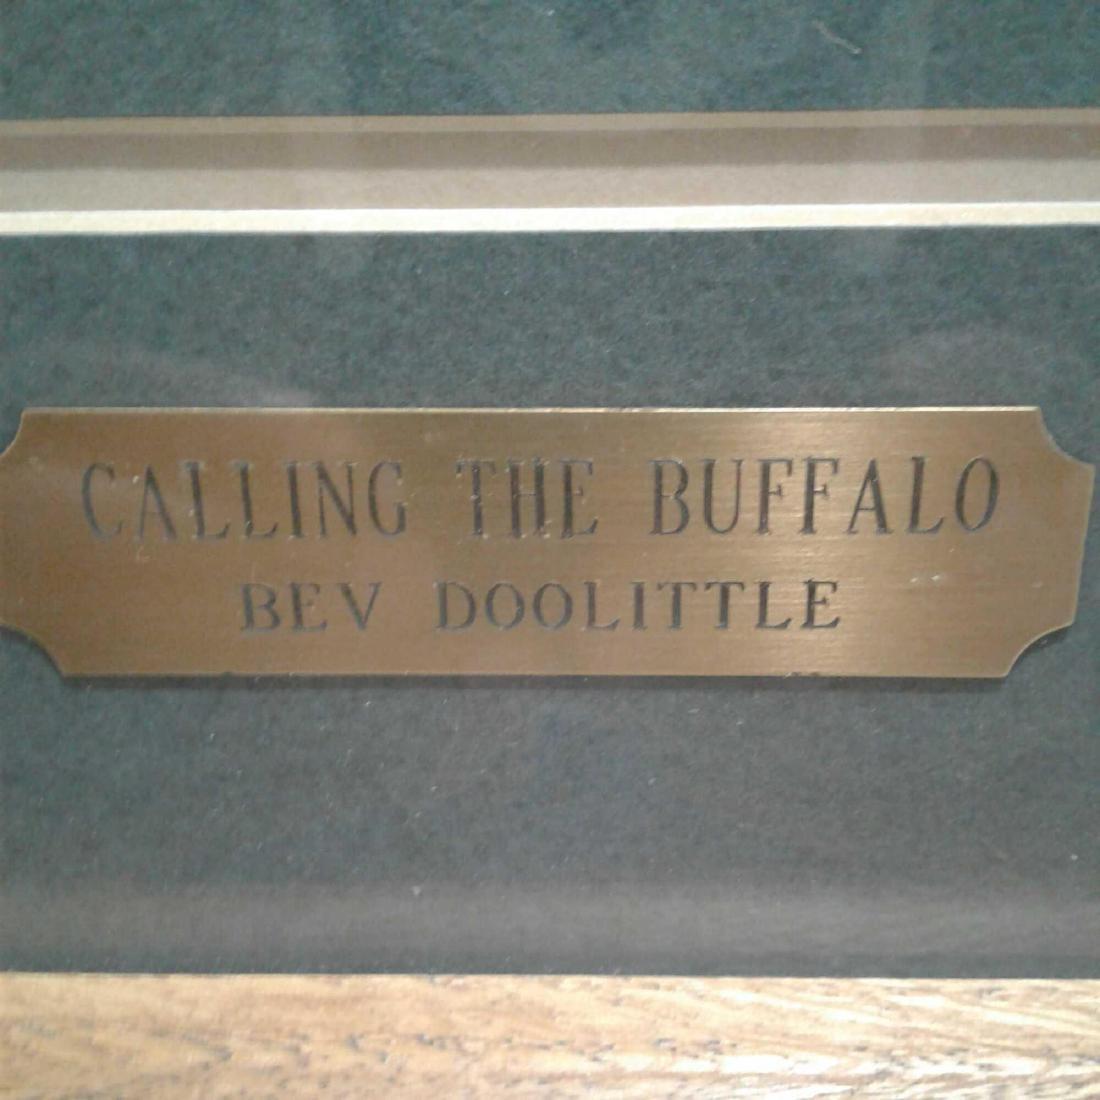 """Calling the Buffalo"" by Bev Doolittle - 5"